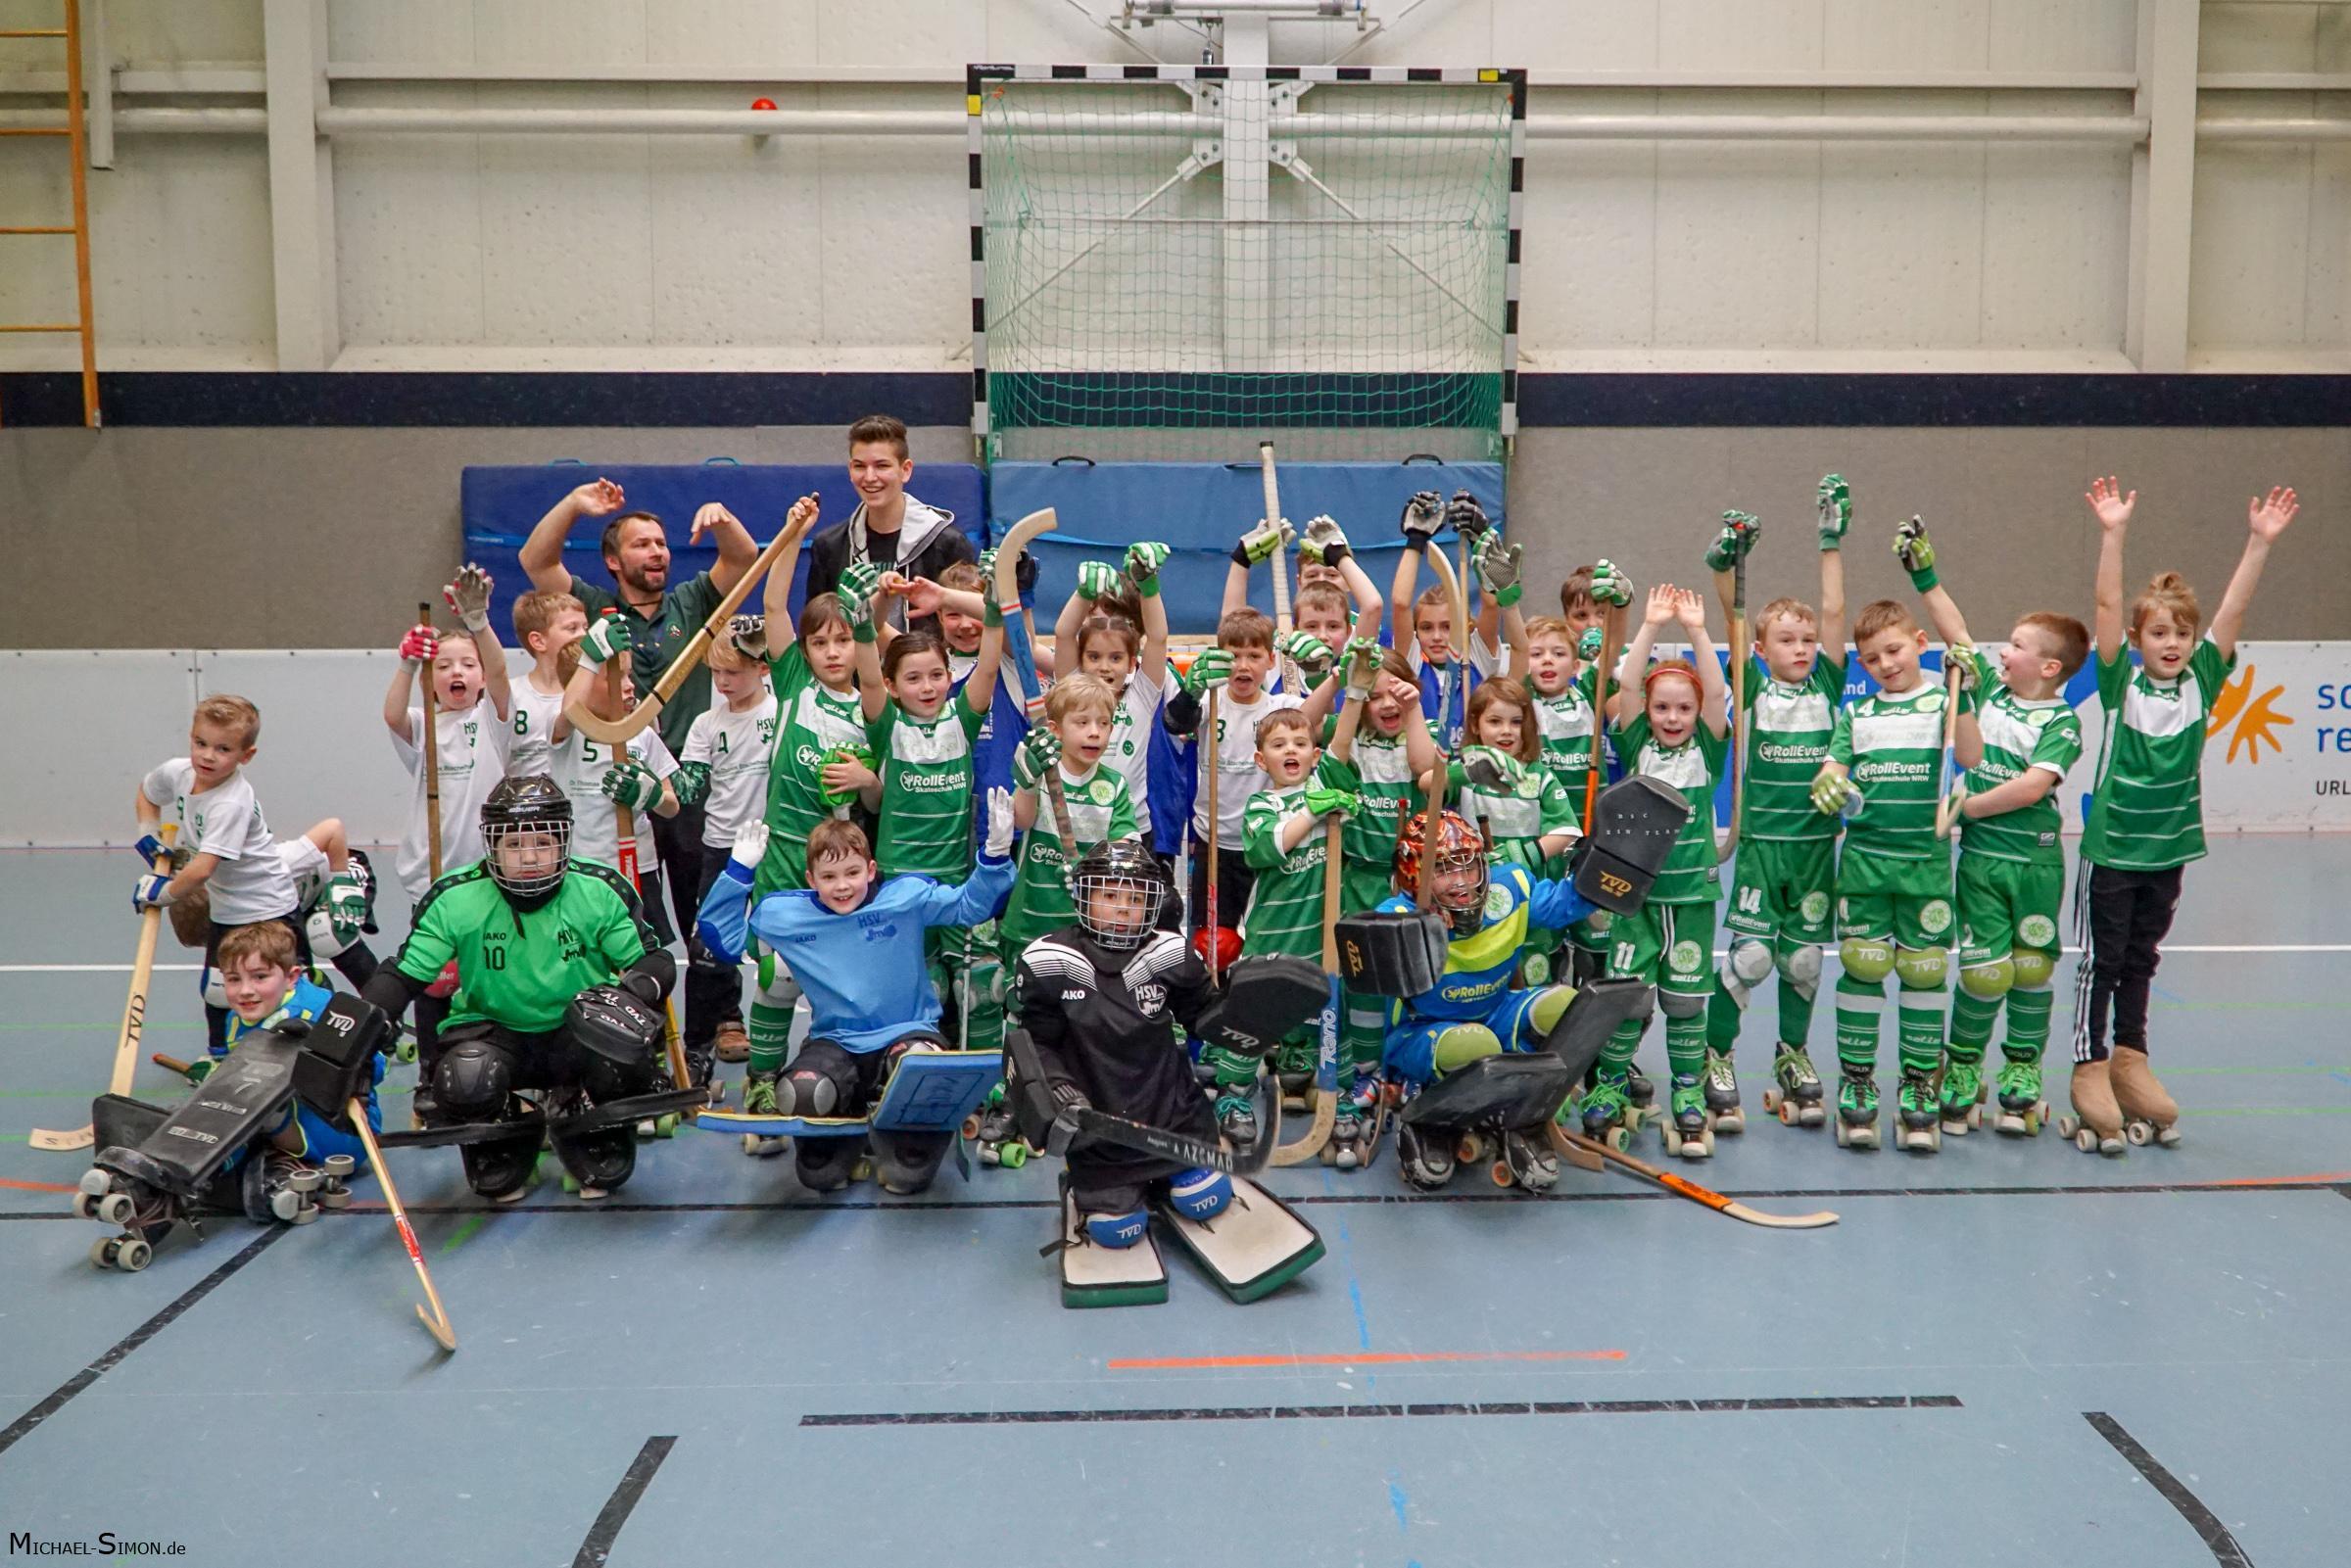 RSC Cronenberg Rollhockey Freundschaftsspiel HSV Krefeld 18.02.2017